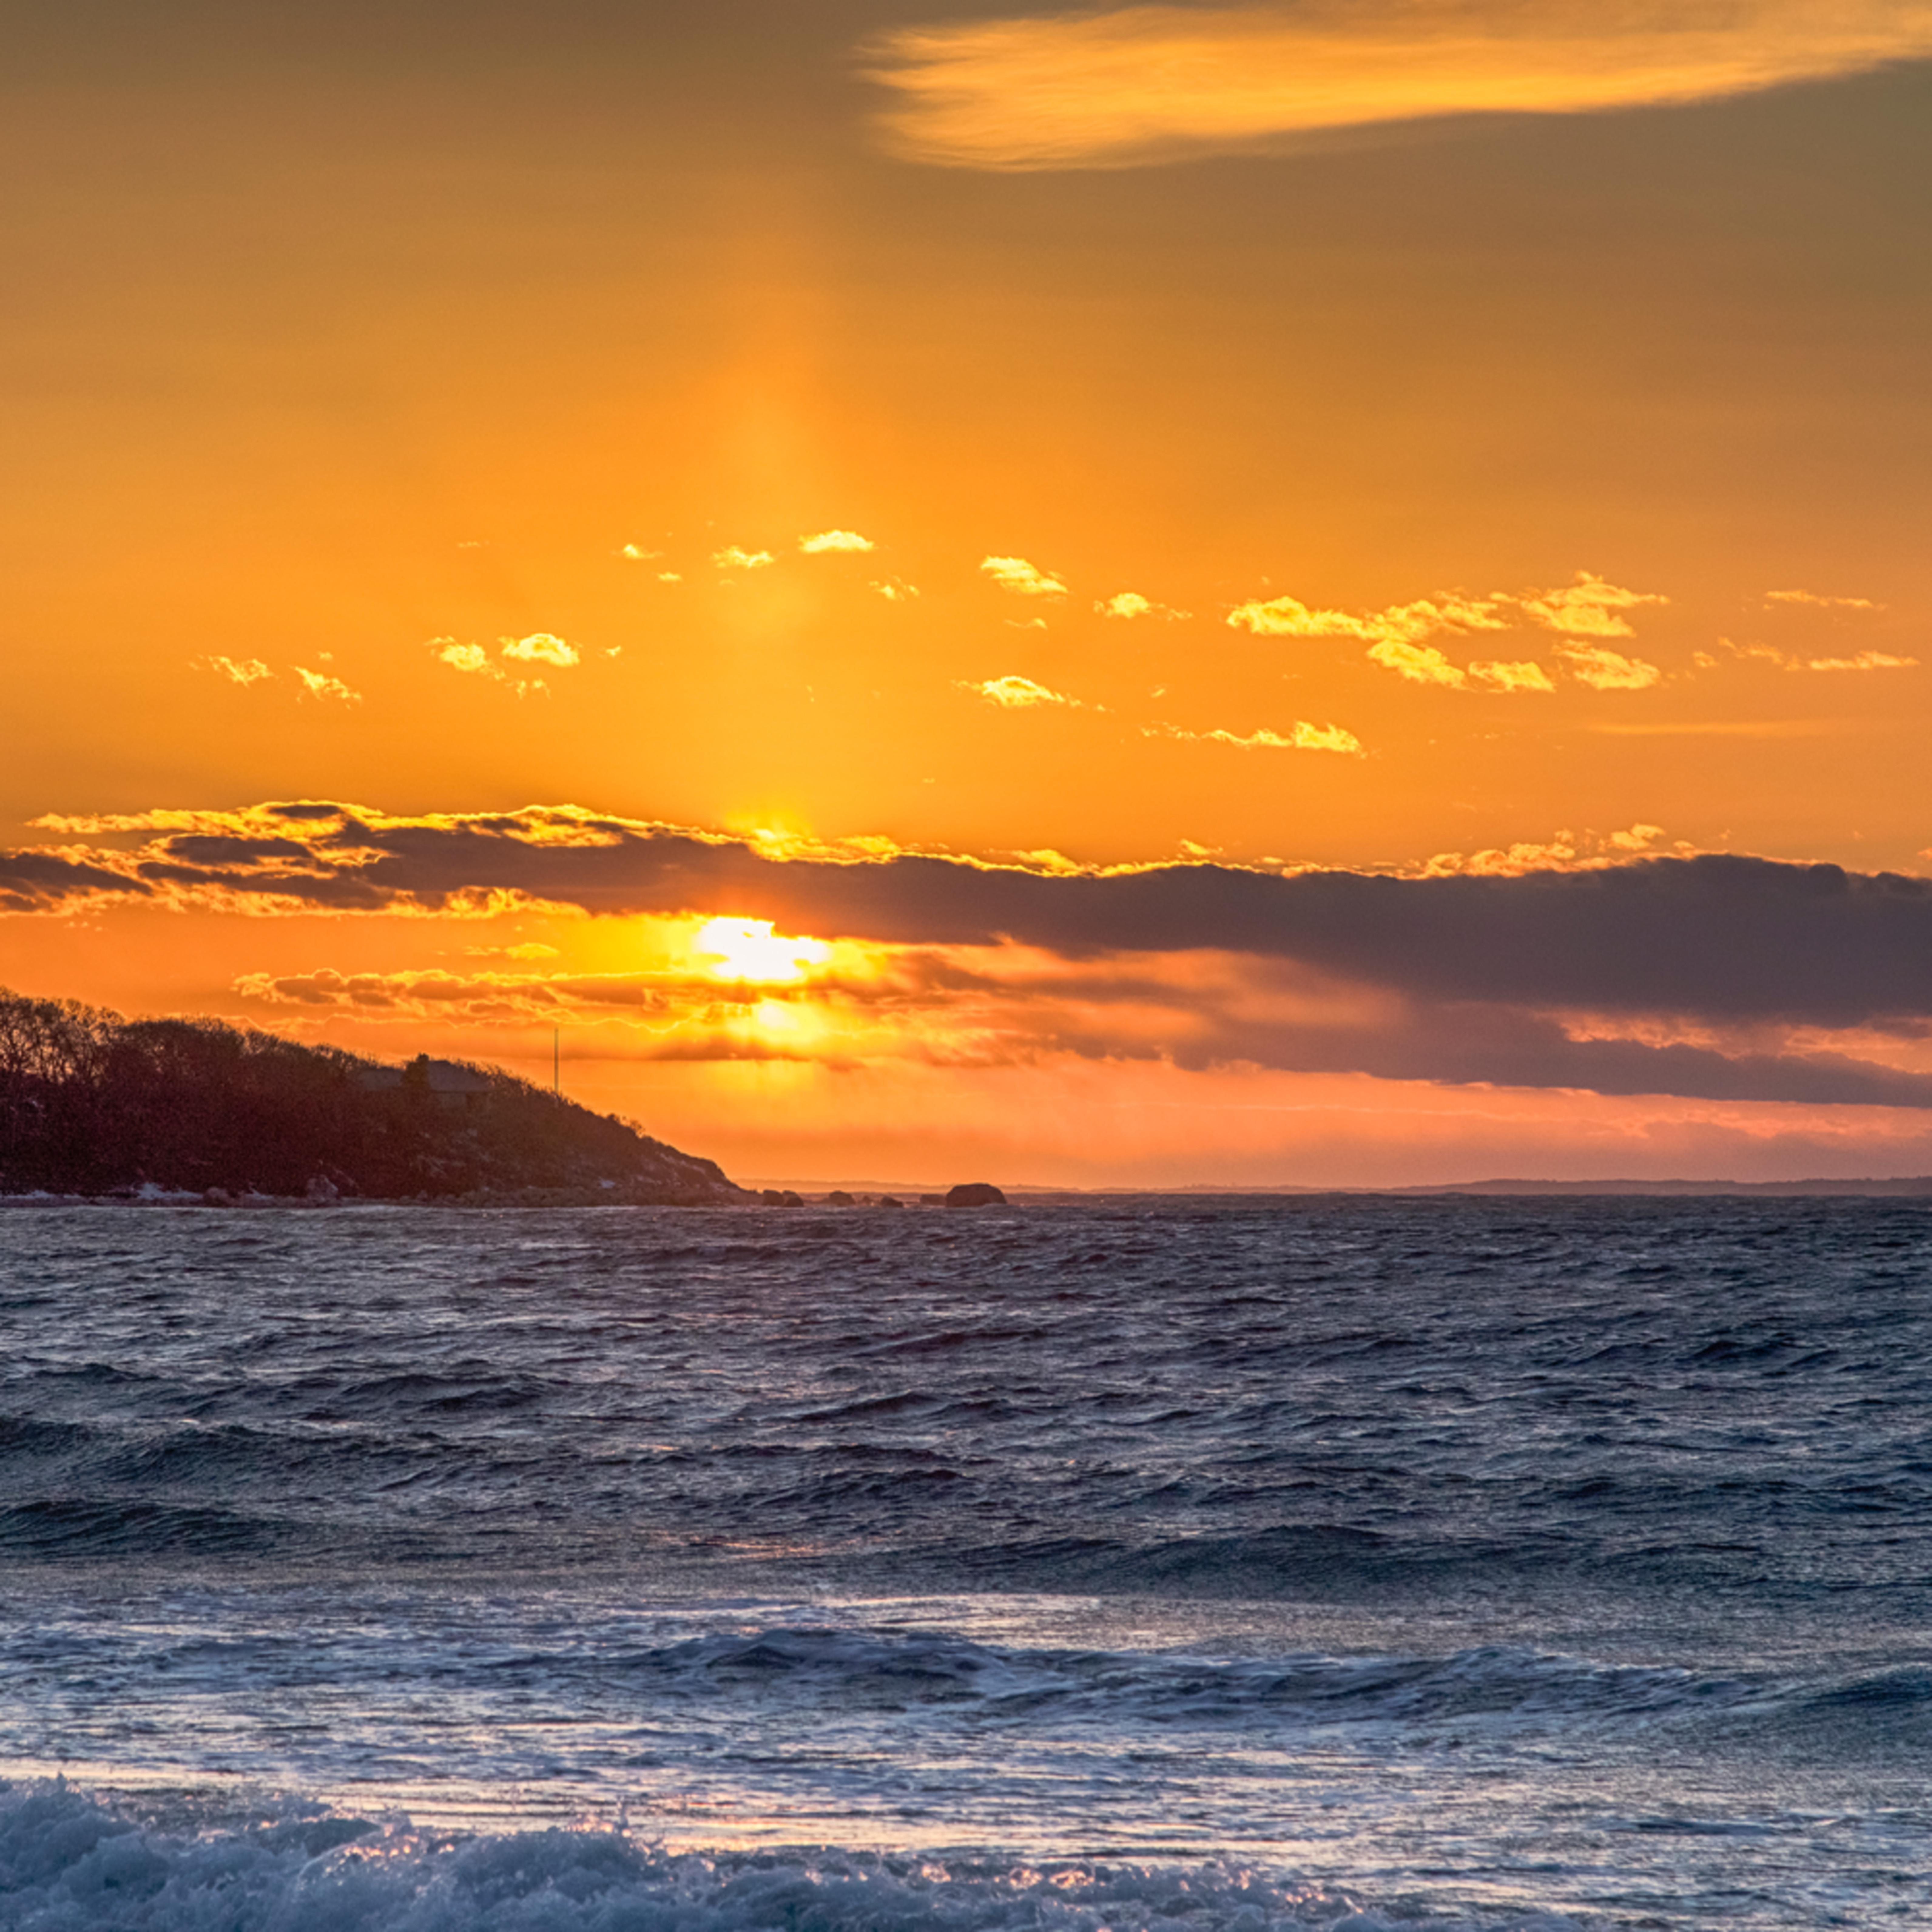 Lambert s cove winter sunset a4eduw